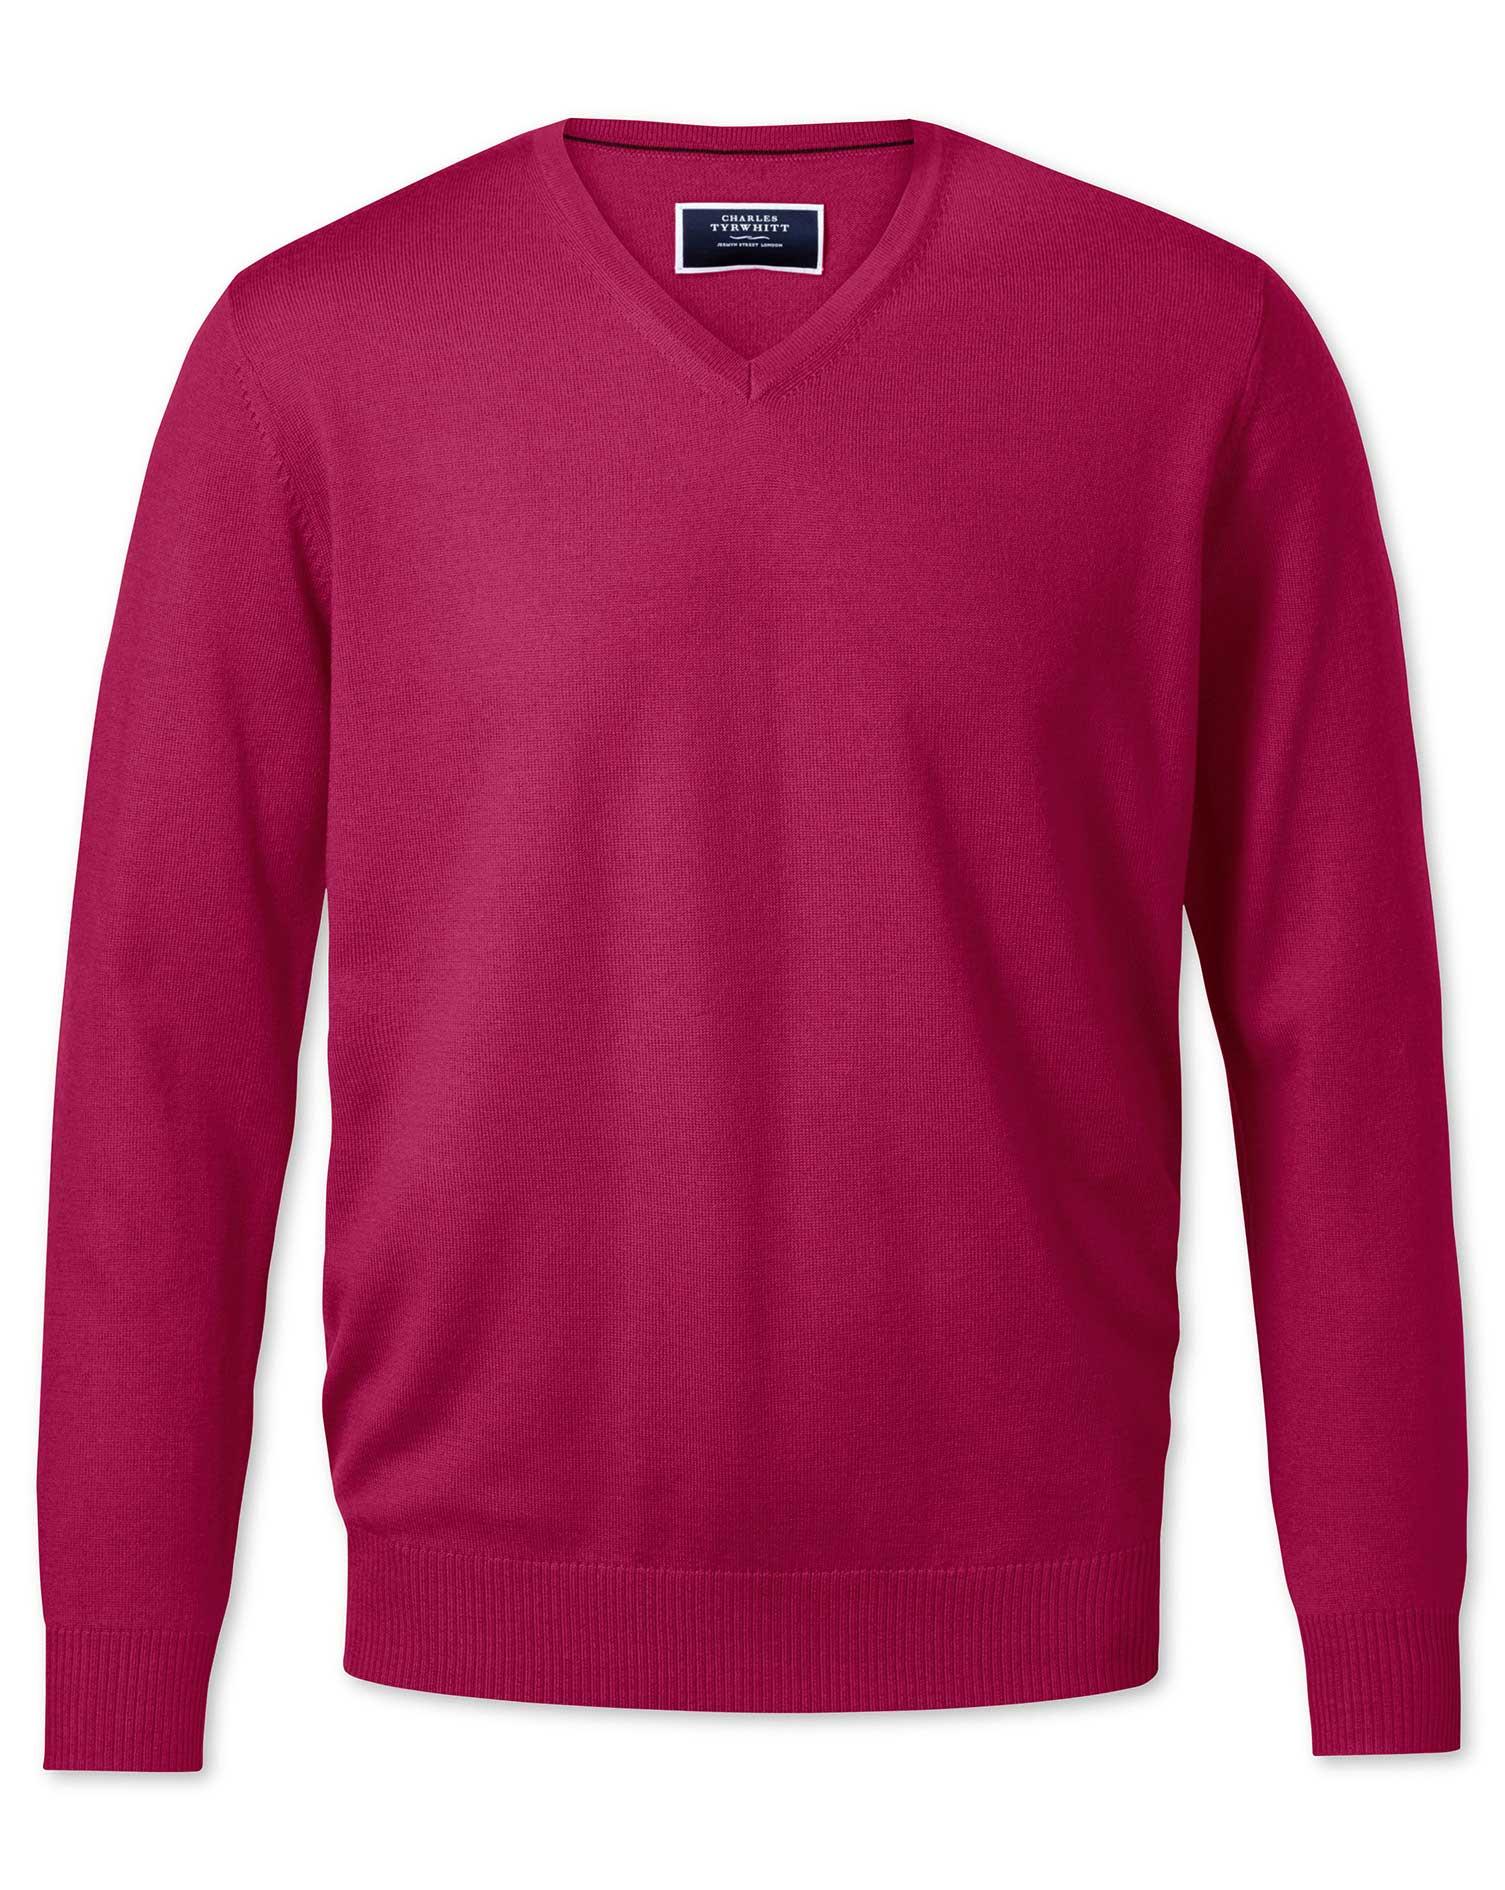 Dark Pink V-Neck Merino Wool Jumper Size Small by Charles Tyrwhitt